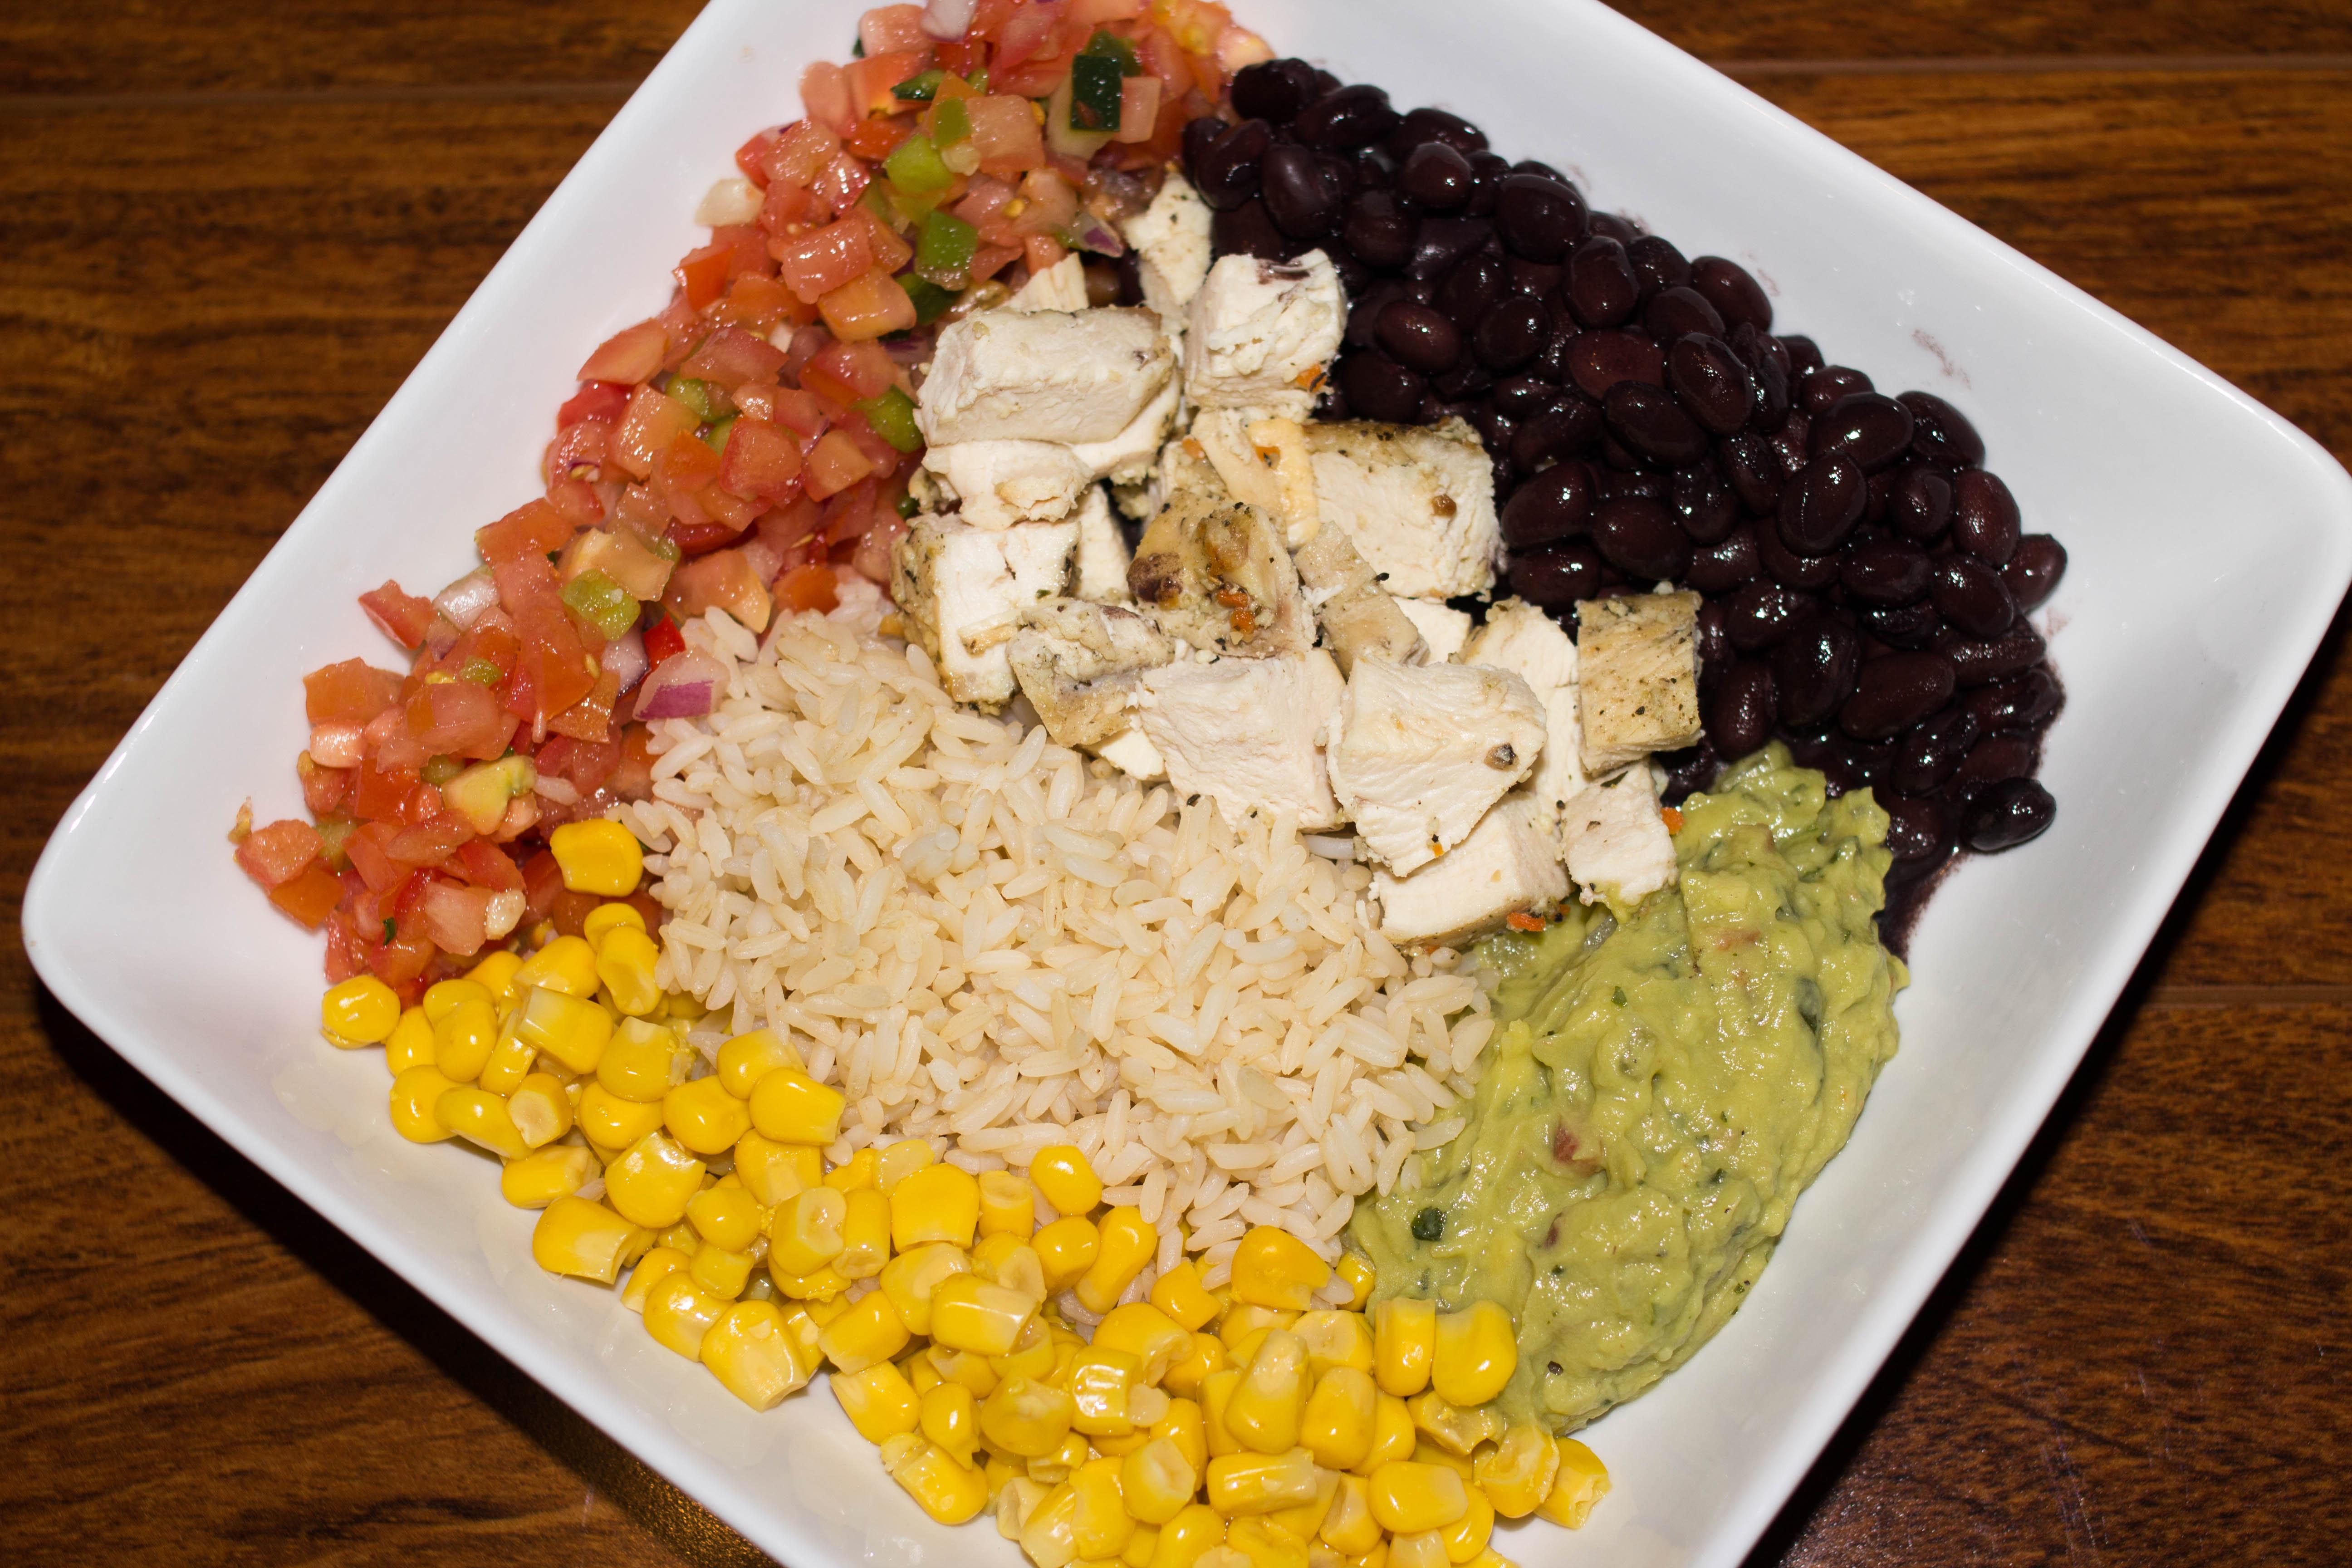 Chicken Burrito Bowl, all the flavors of a burrito in a tasty bowl